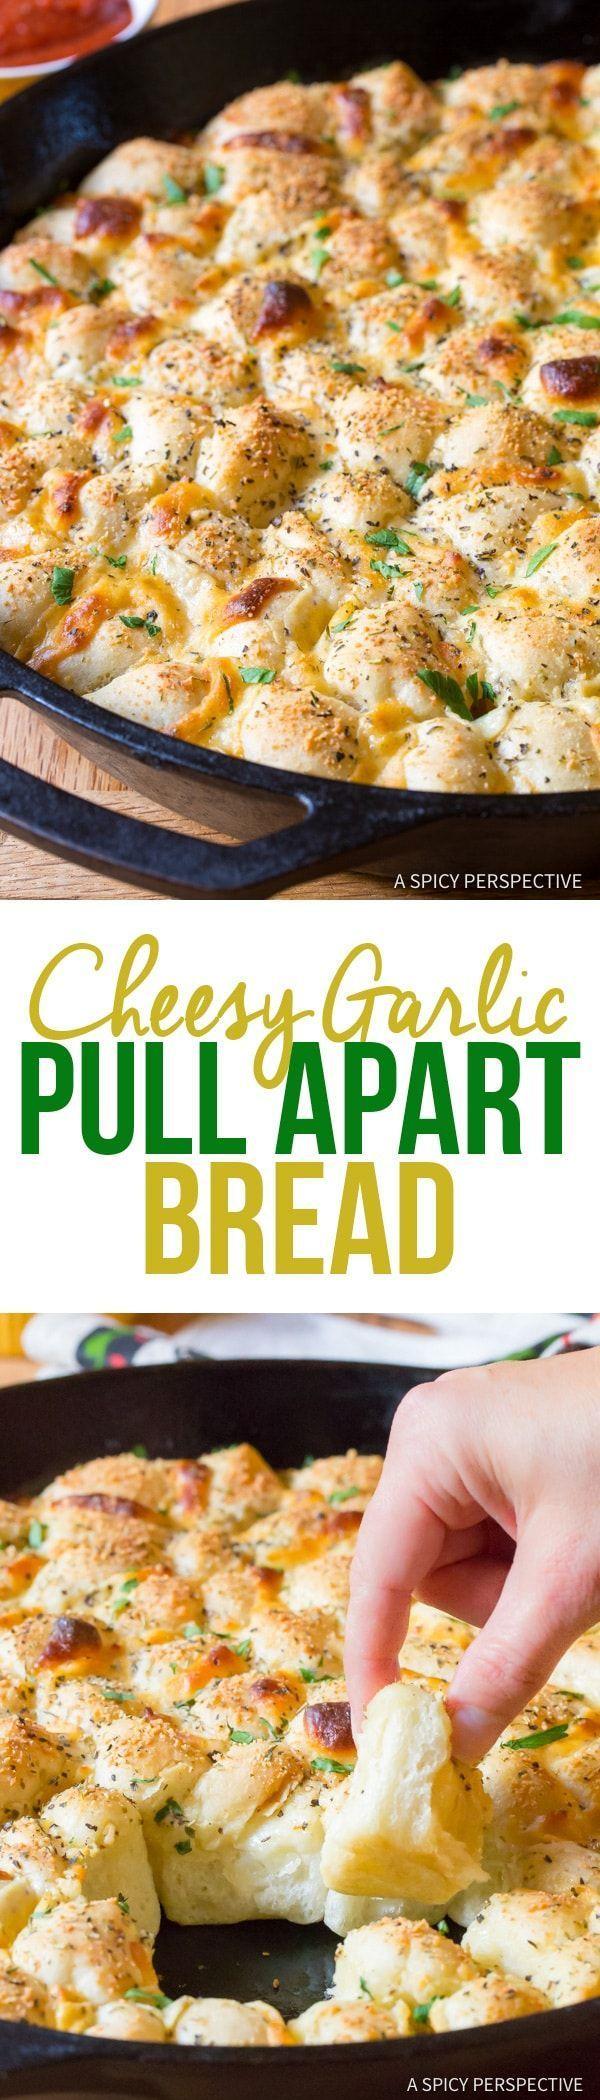 6-Ingredient Cheesy Garlic Pull Apart Bread Recipe | A Spicy Perspective /landolakesktchn/ #addalittlegood #ad